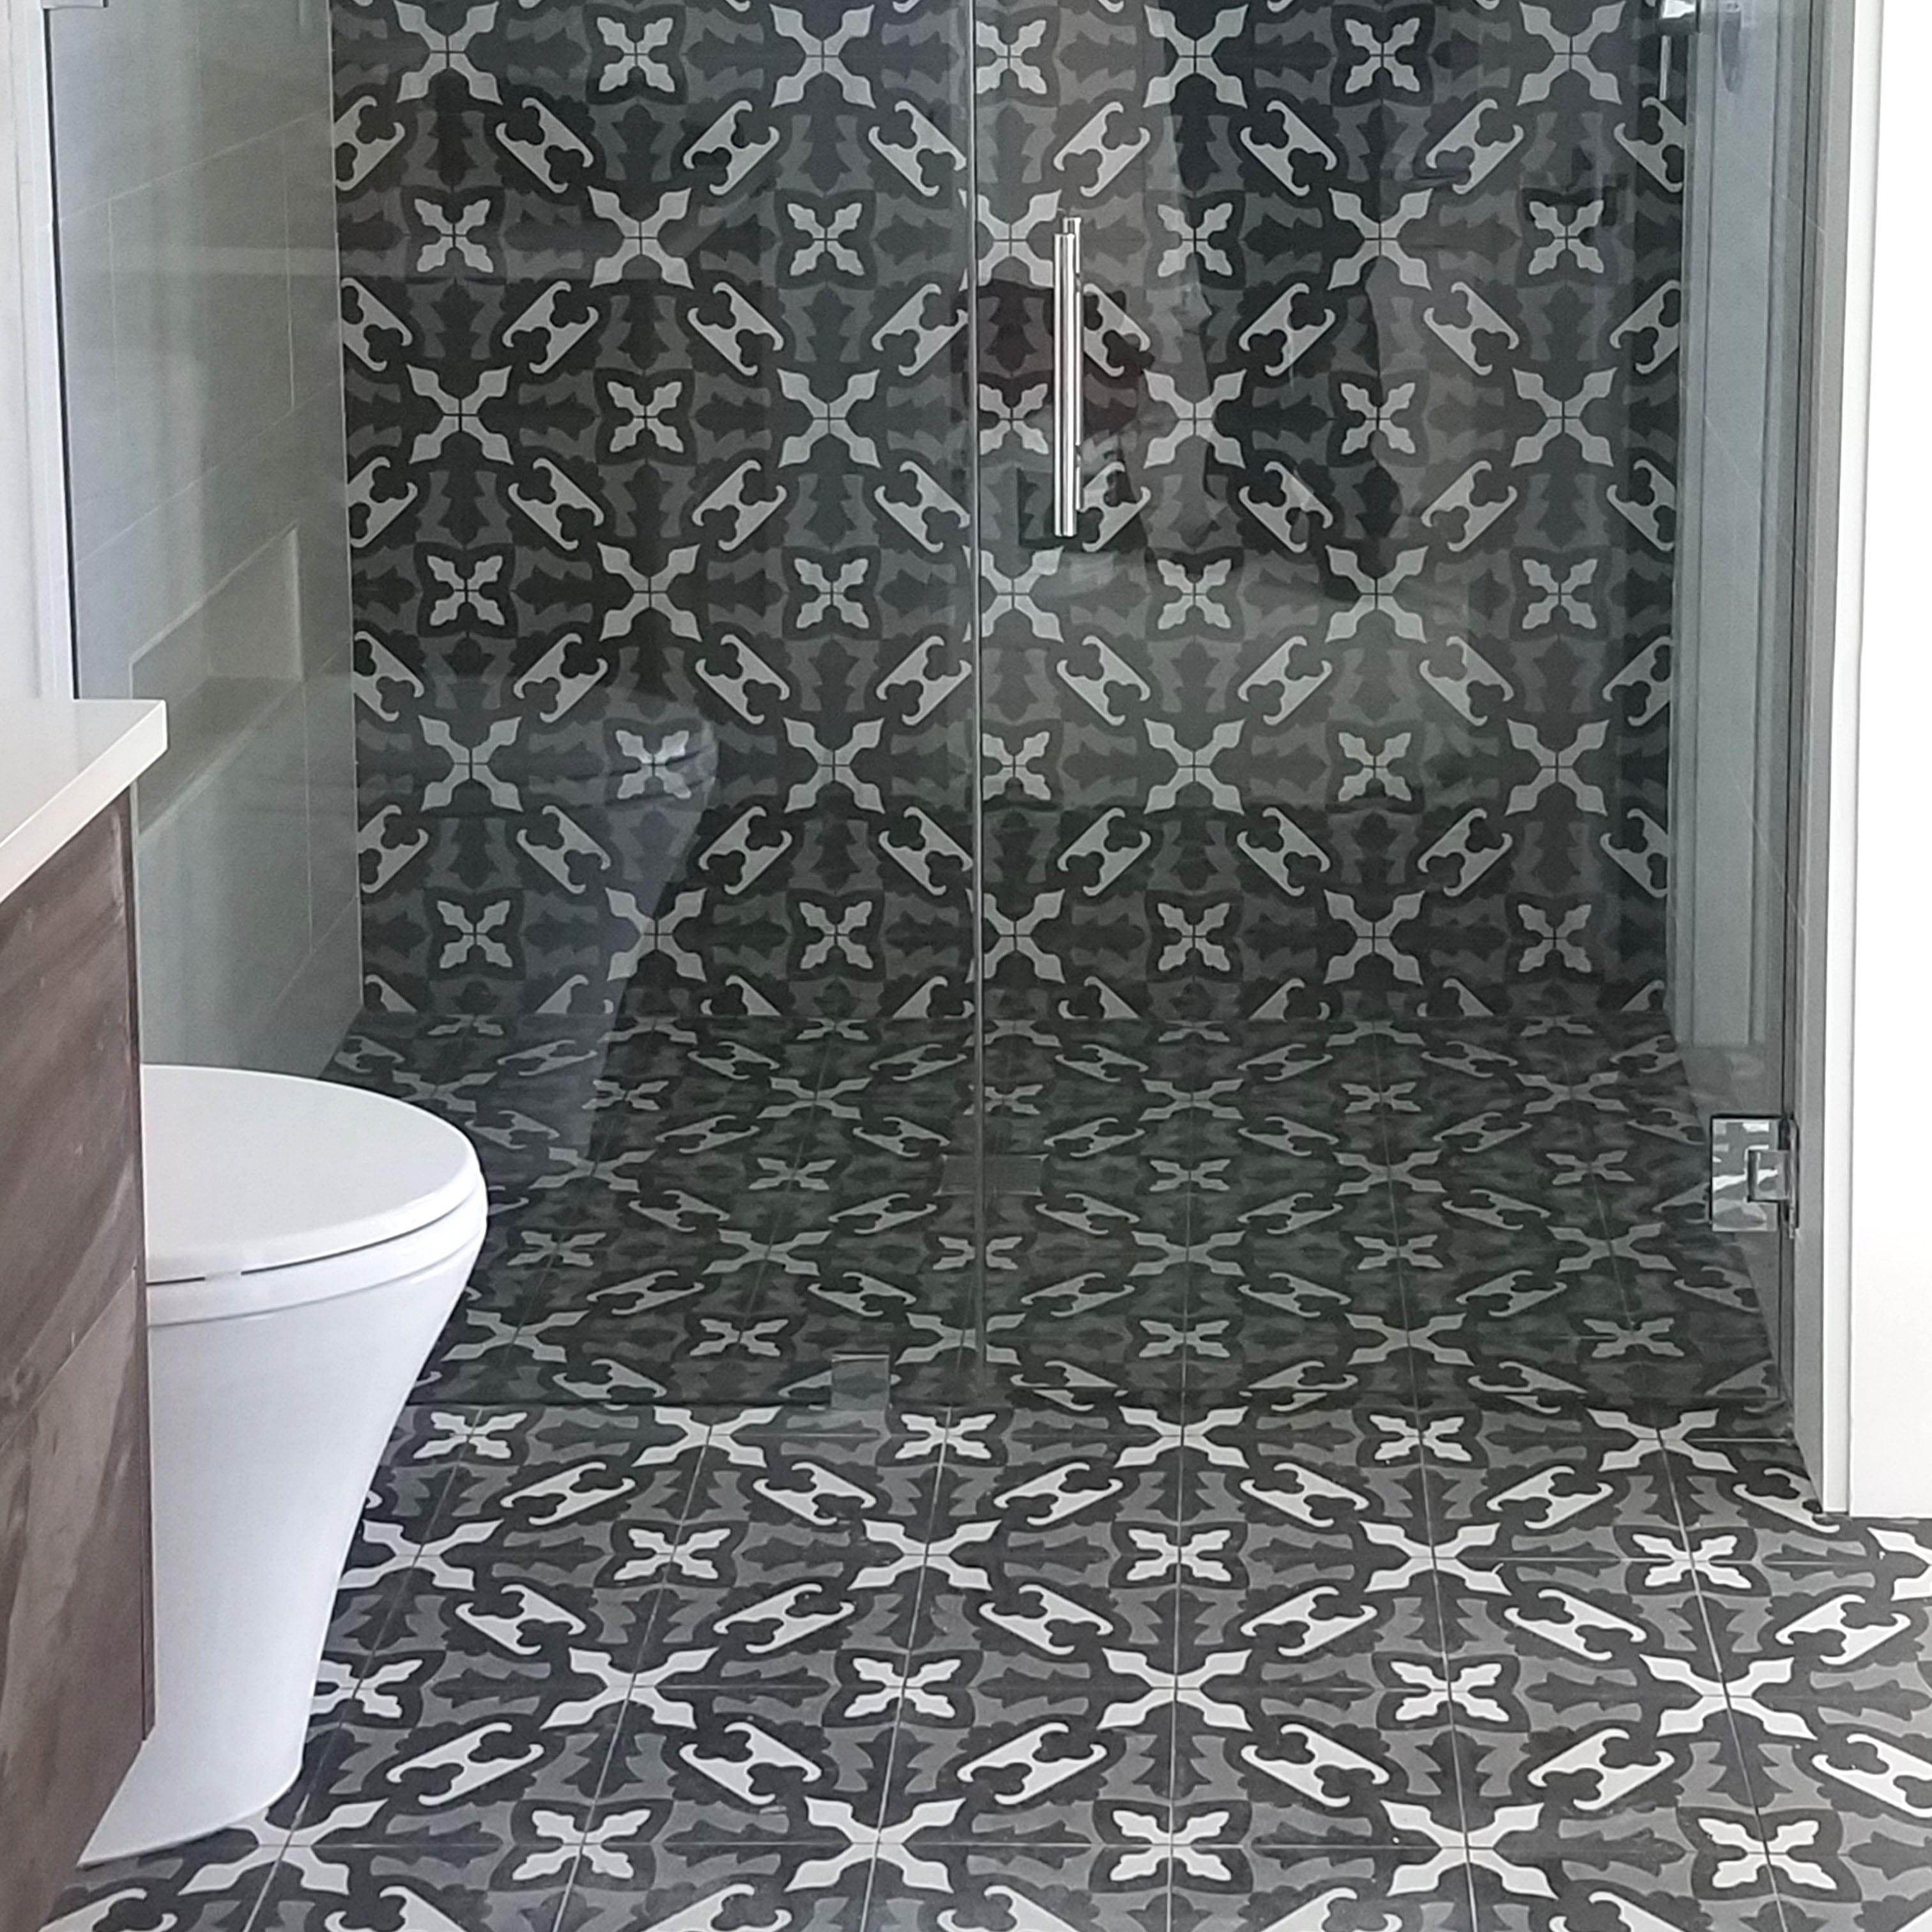 Farfalla Honed Cement Tiles 8x8 Country Floors Of America Llc Bathroom Floor Tiles Cement Tiles Bathroom Cement Tile